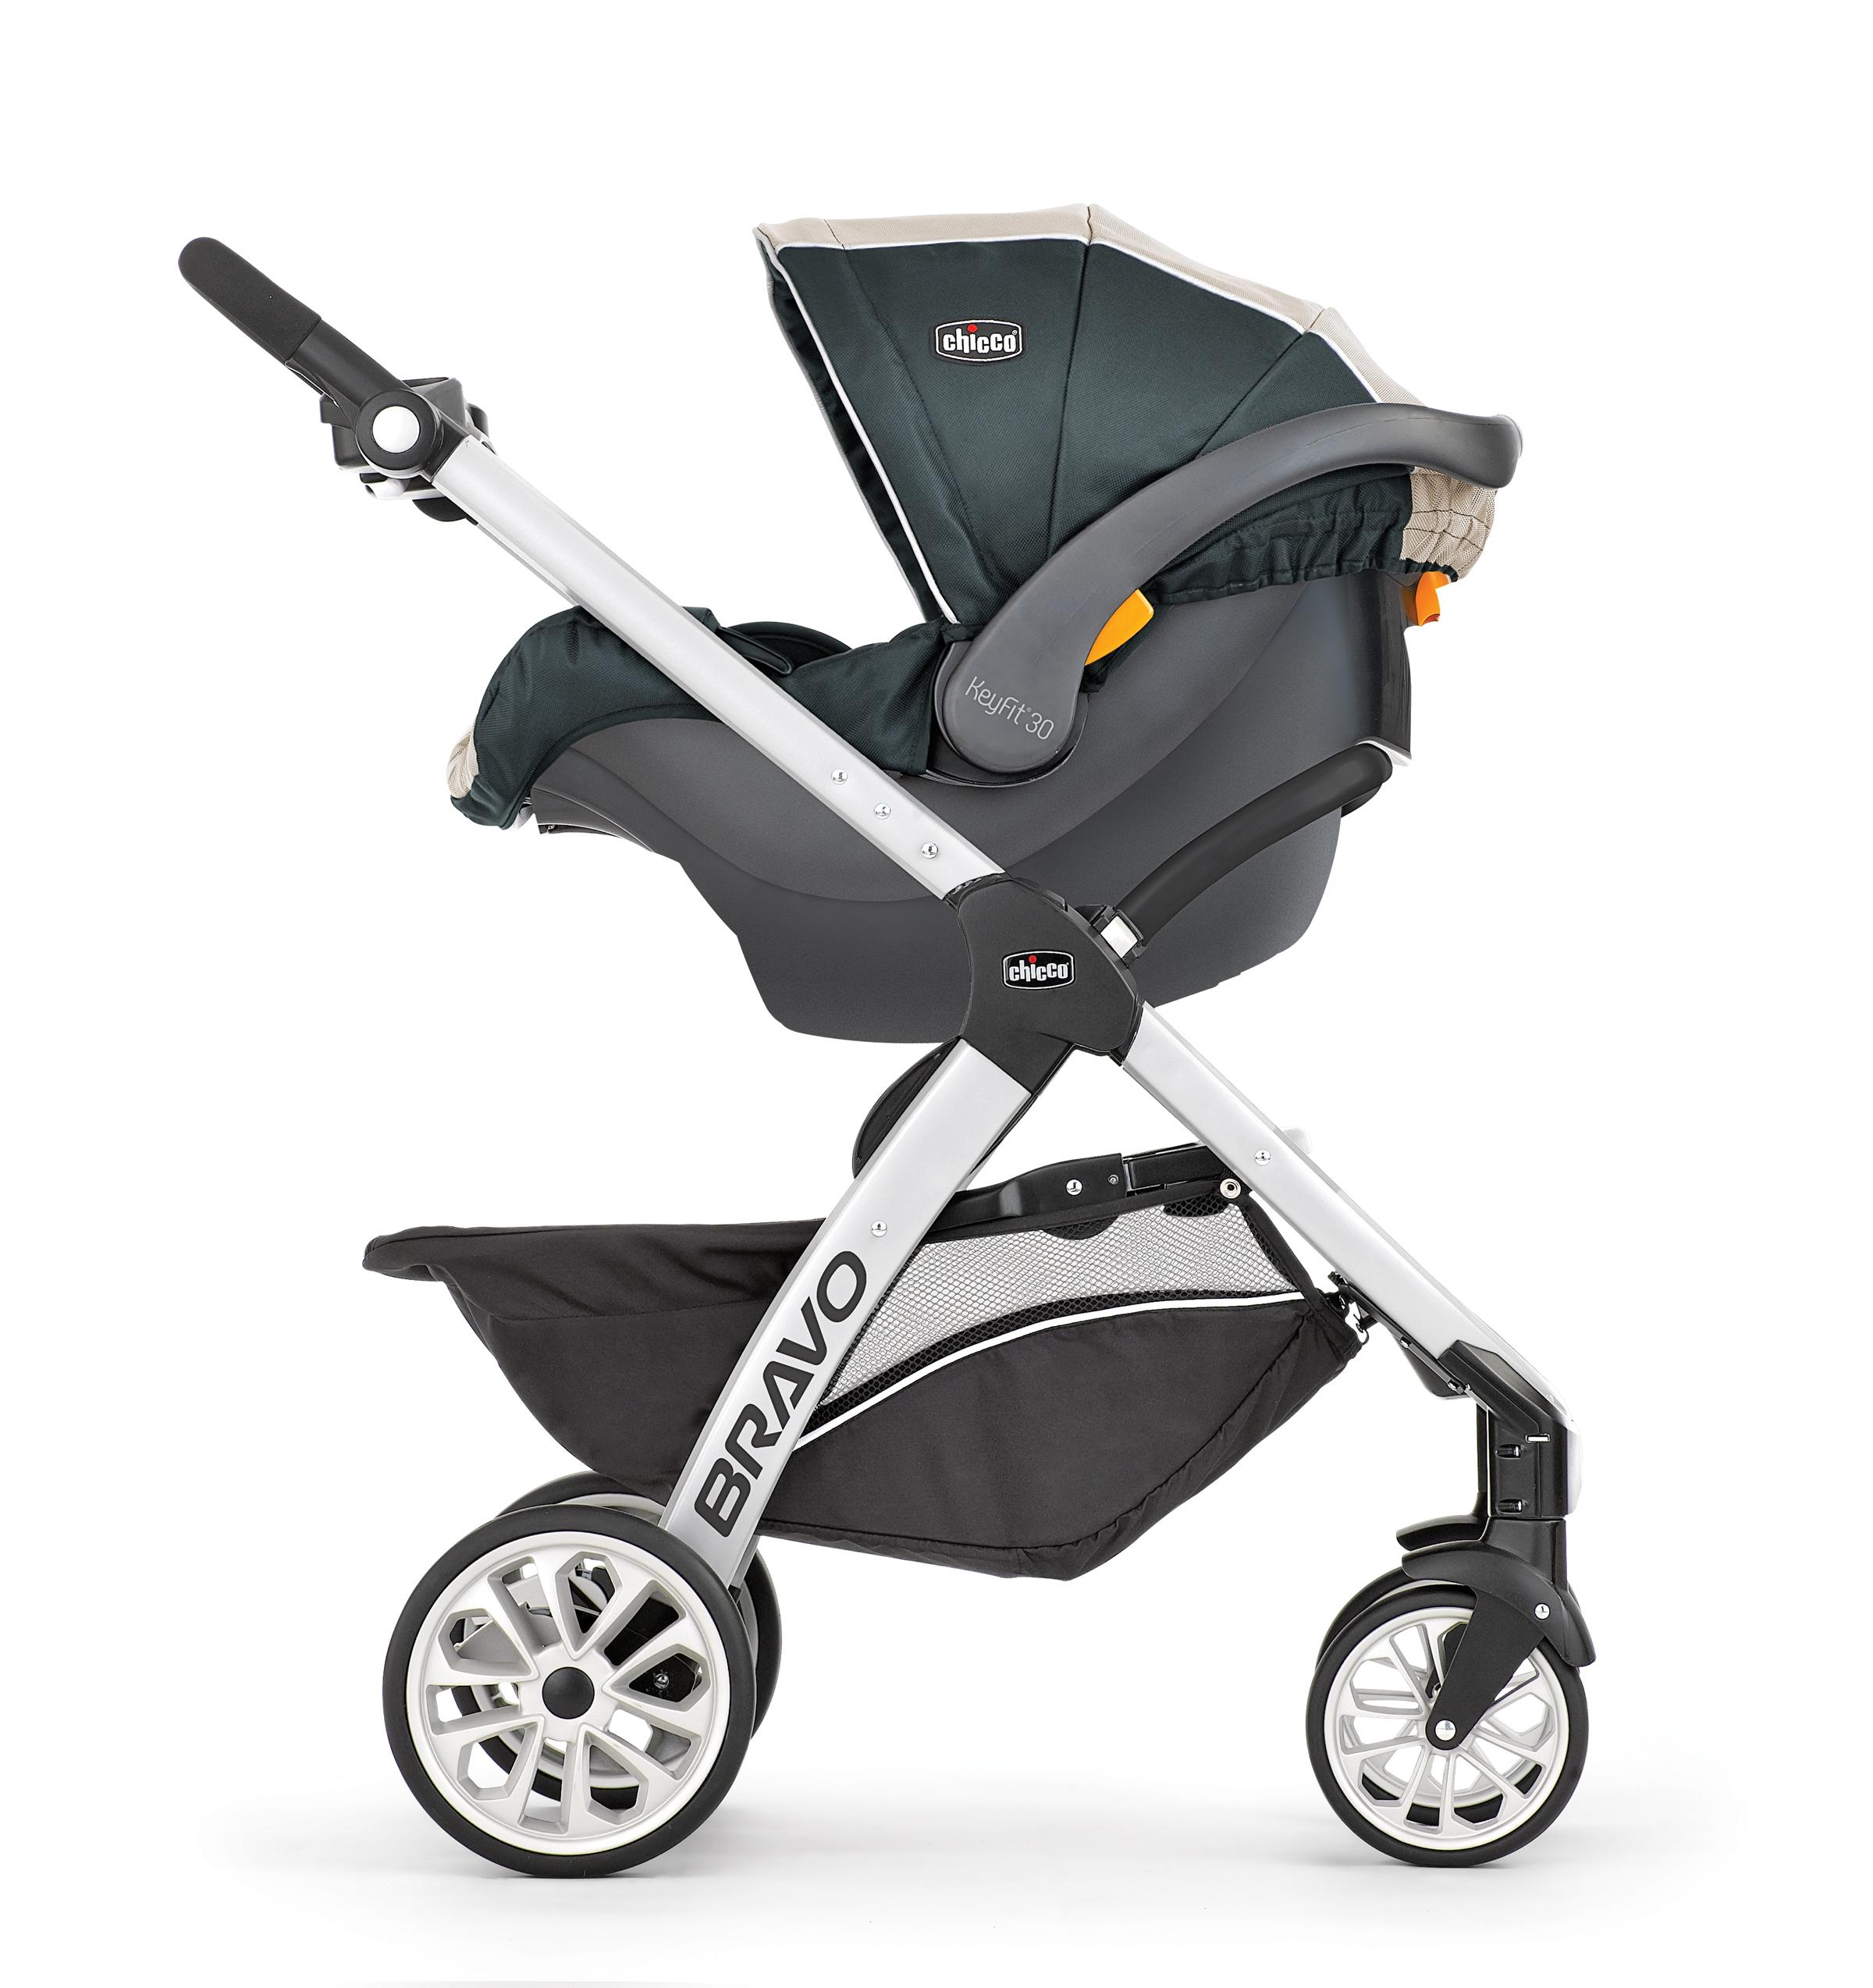 Amazon.com: Chicco Bravo Stroller & Chicco KeyFit - Asiento ...